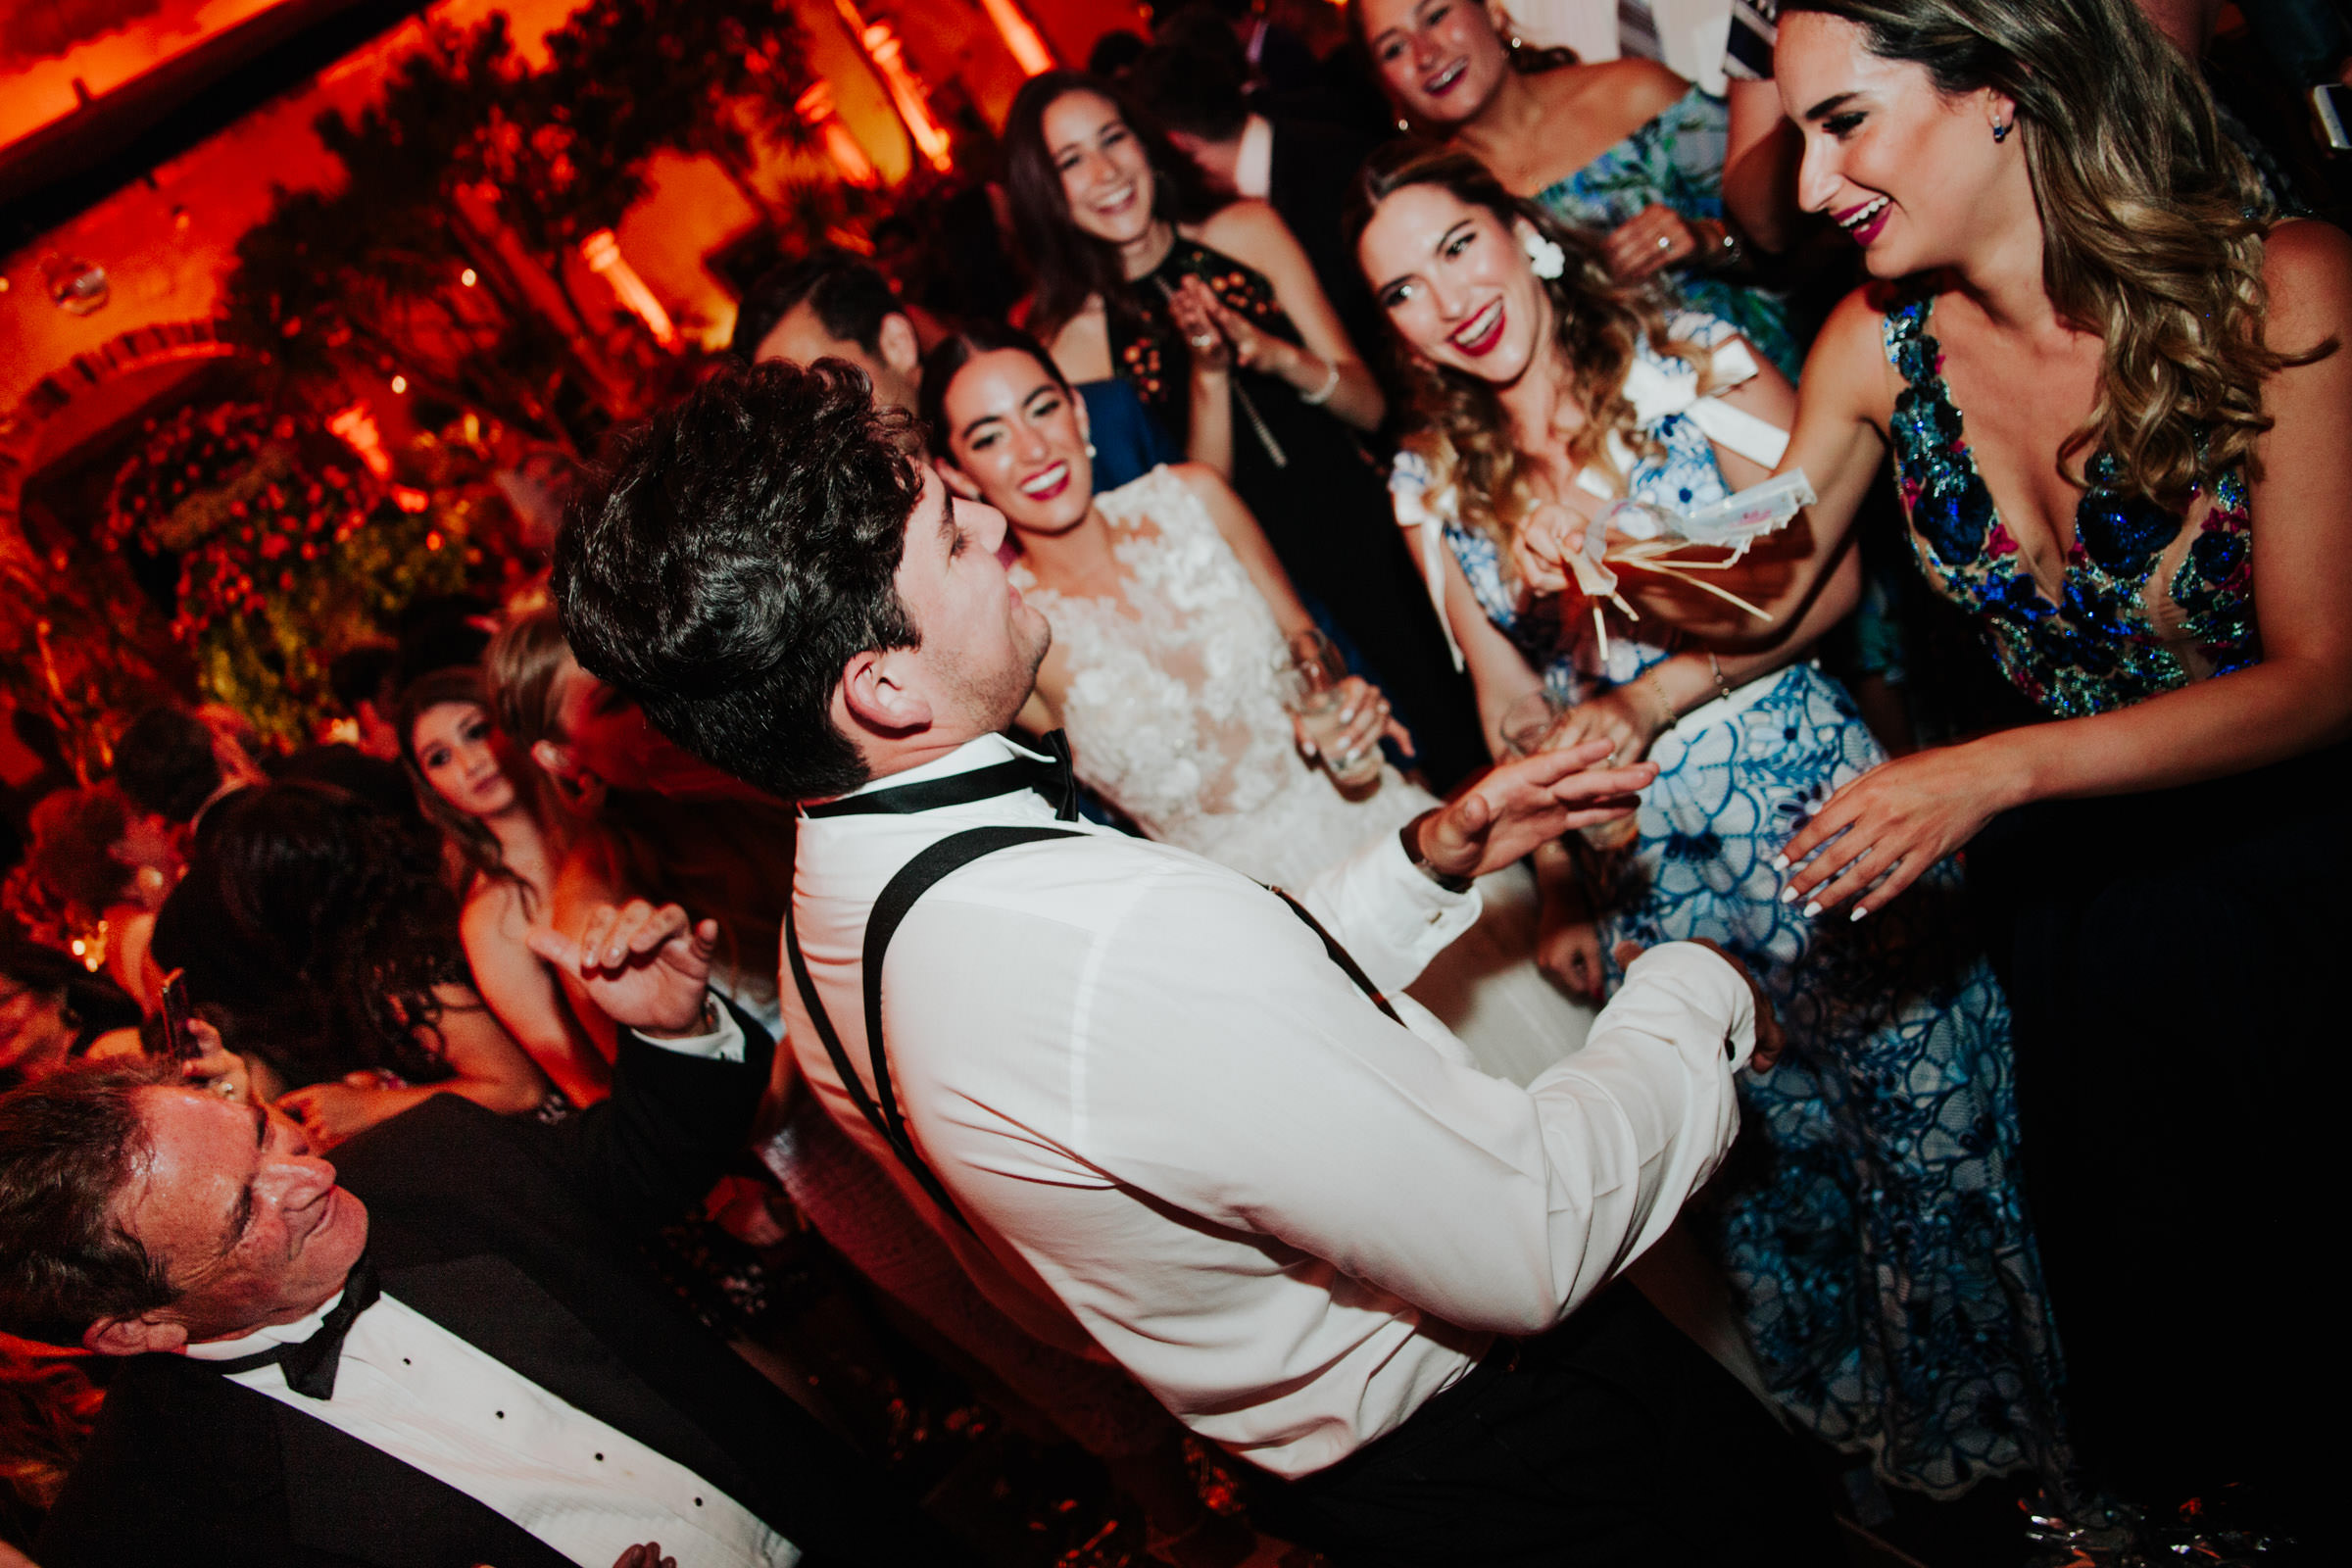 San-Miguel-de-Allende-Wedding-Photography-Parroquia-Instituto-Boda-Fotografia-Fer-Sergio-Pierce-Lifestyle-Photography0063.JPG